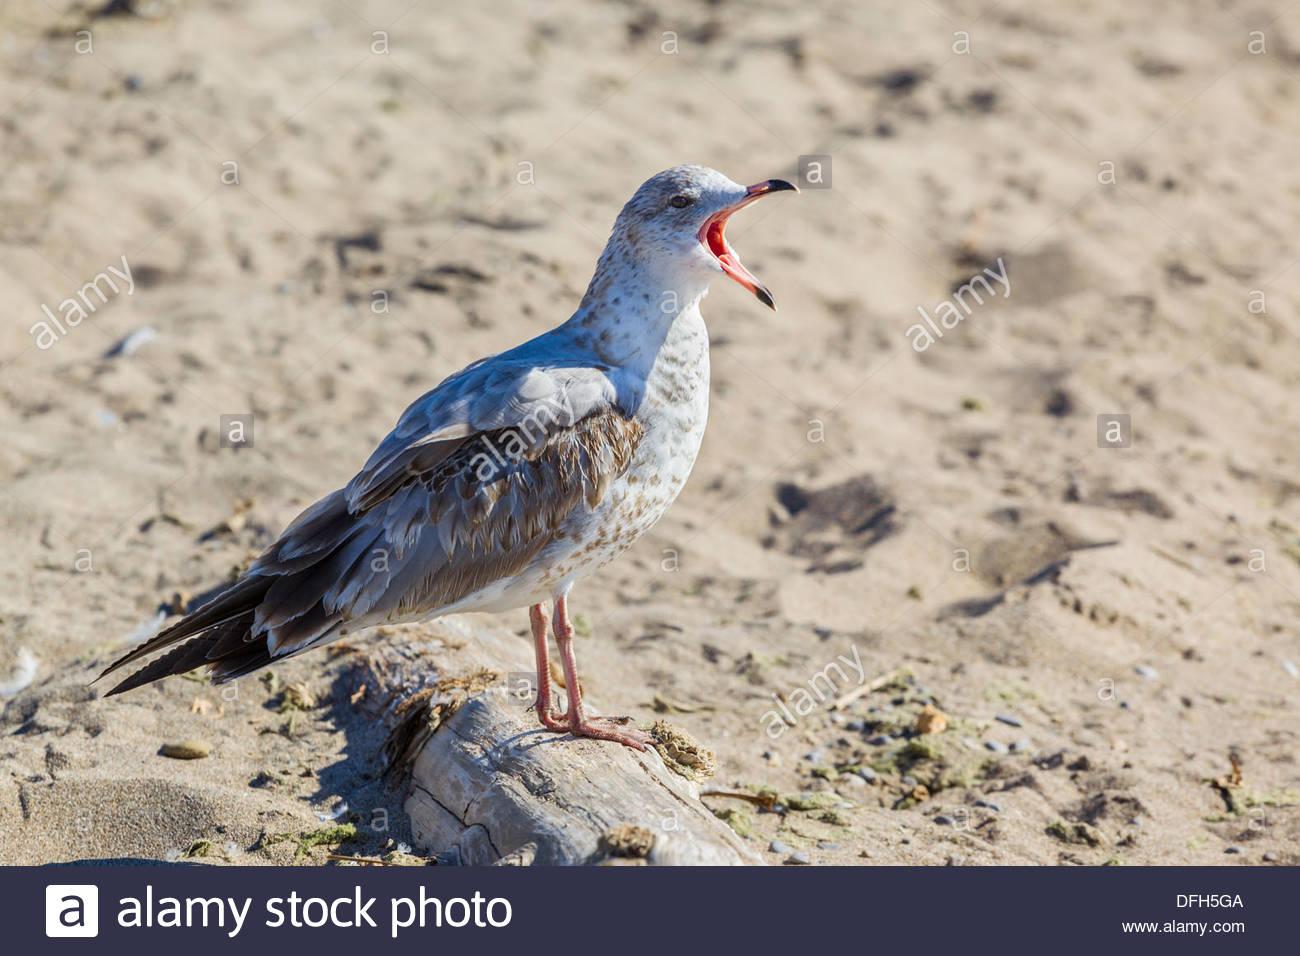 Immature Ring-billed Gull (Larus delawarensis) Stock Photo